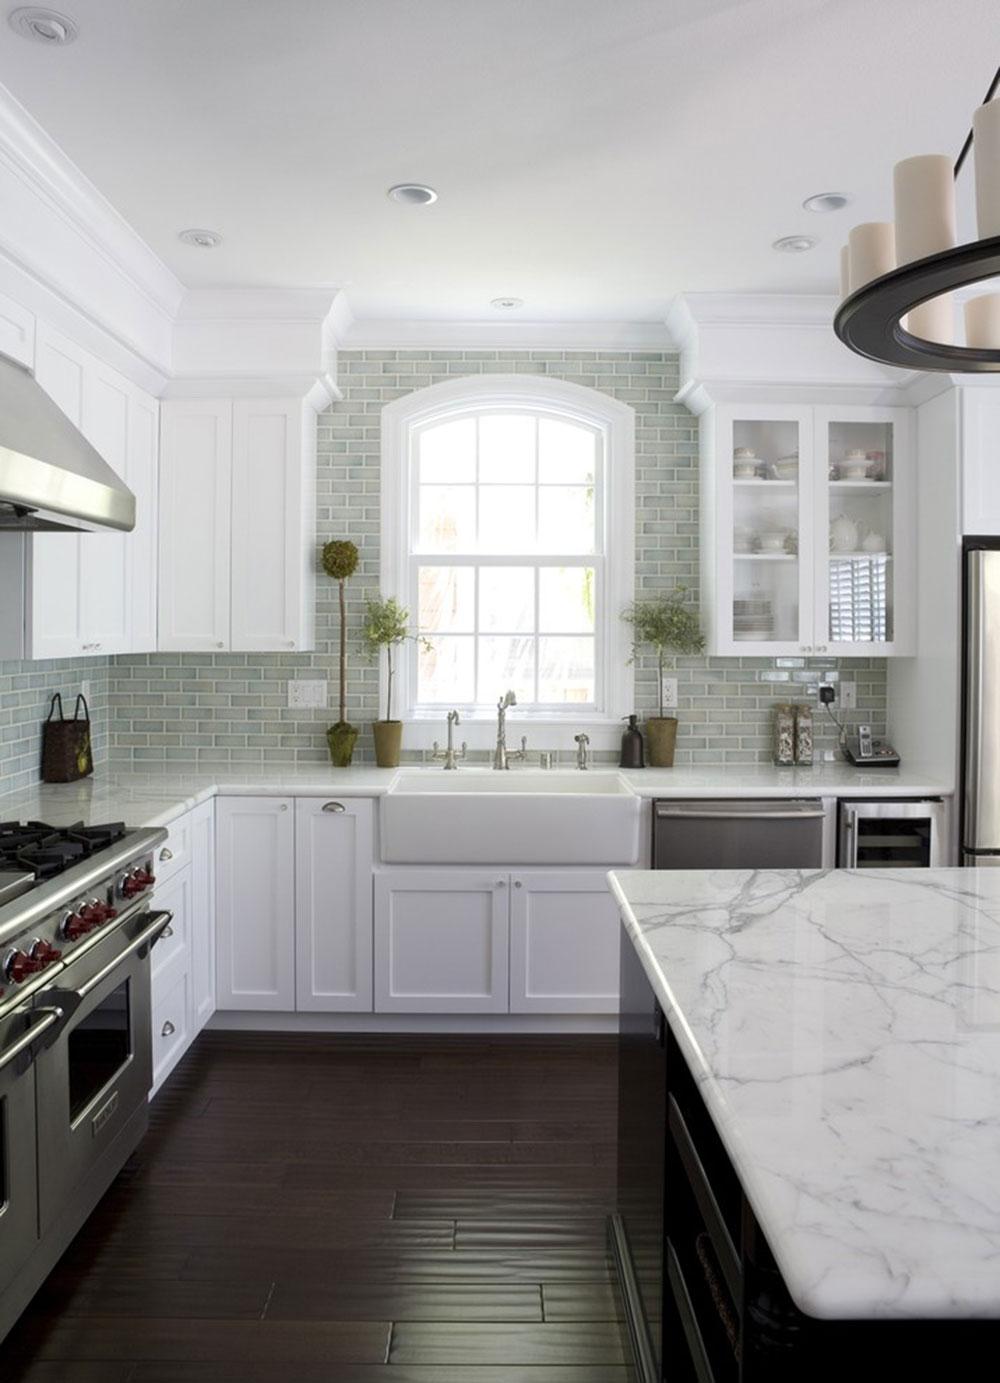 Modern Kitchen Backsplashes Modern Brick Backsplash Kitchen Ideas